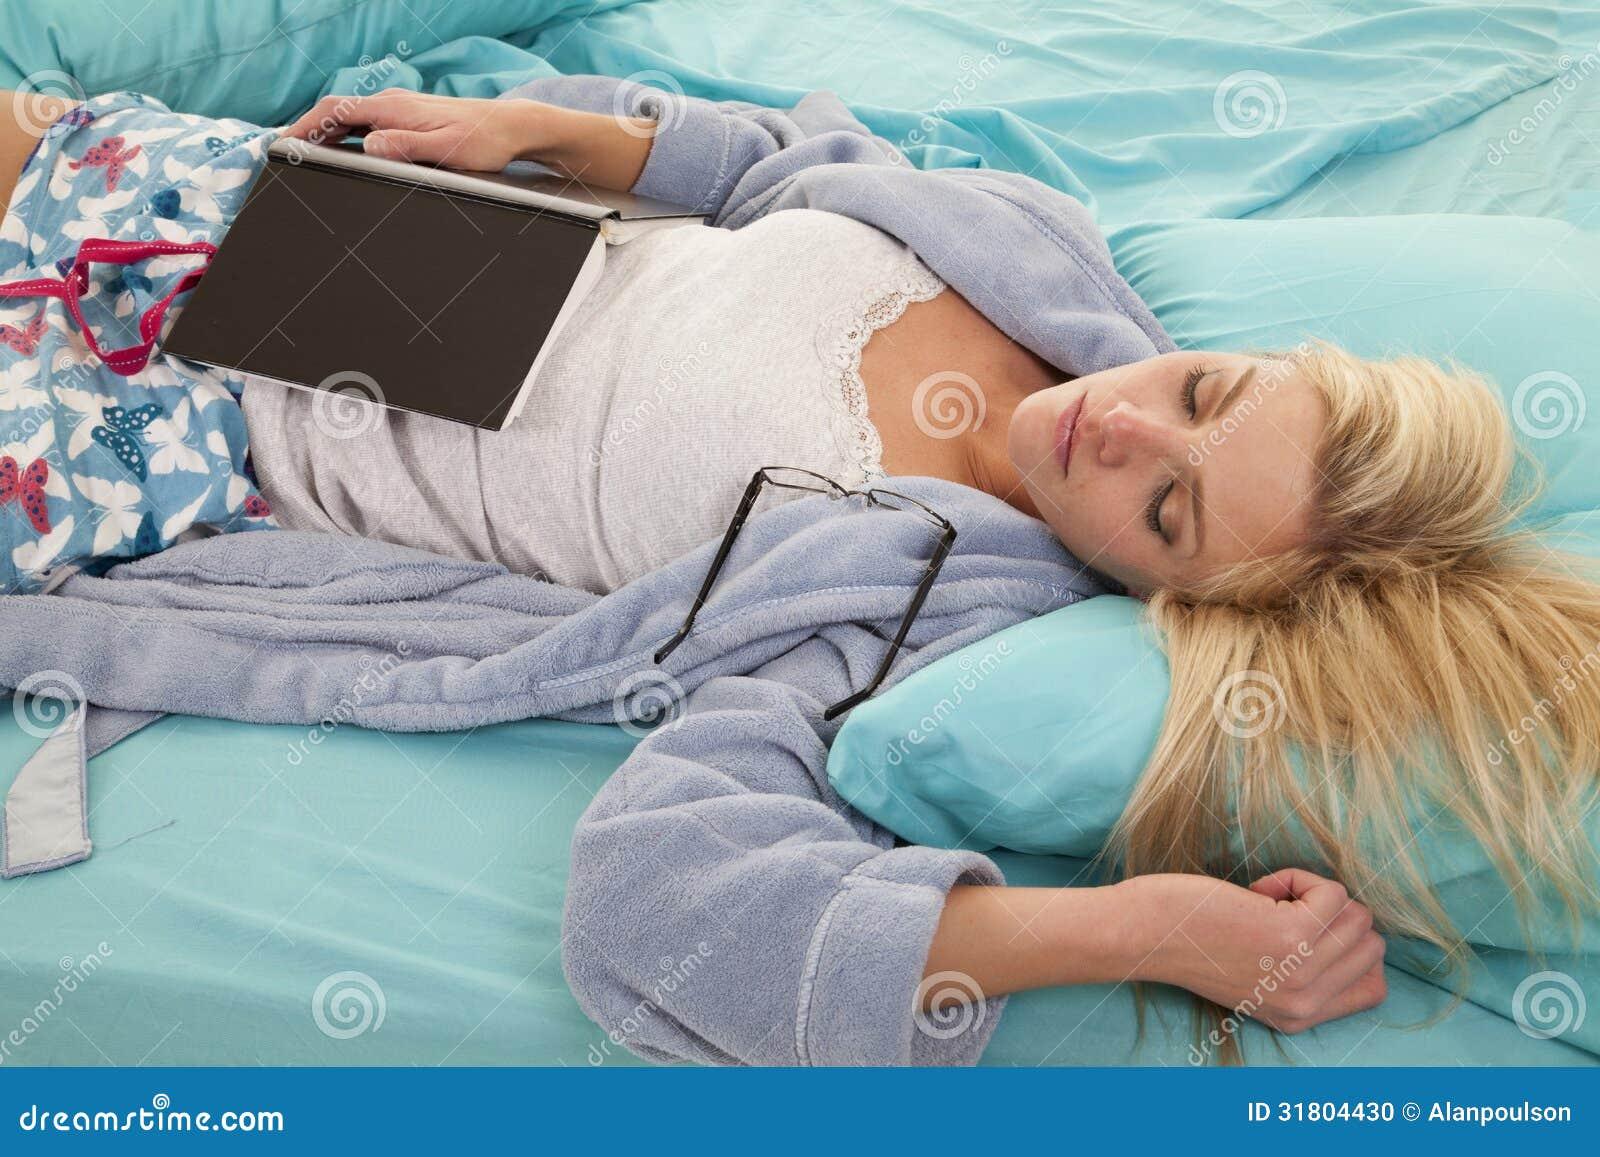 Woman Sleep Book Tired Stock Photo - Image: 31804430